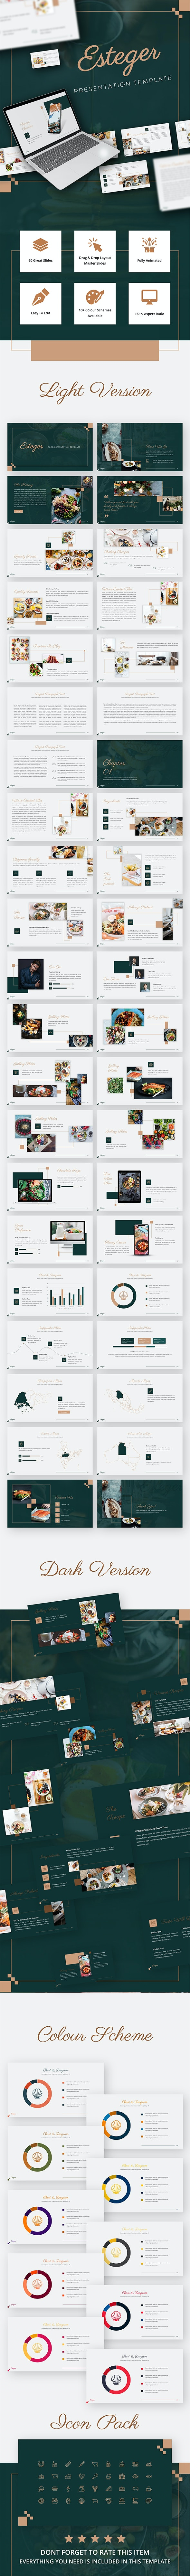 Esteger Delight Presentation Template - PowerPoint Templates Presentation Templates